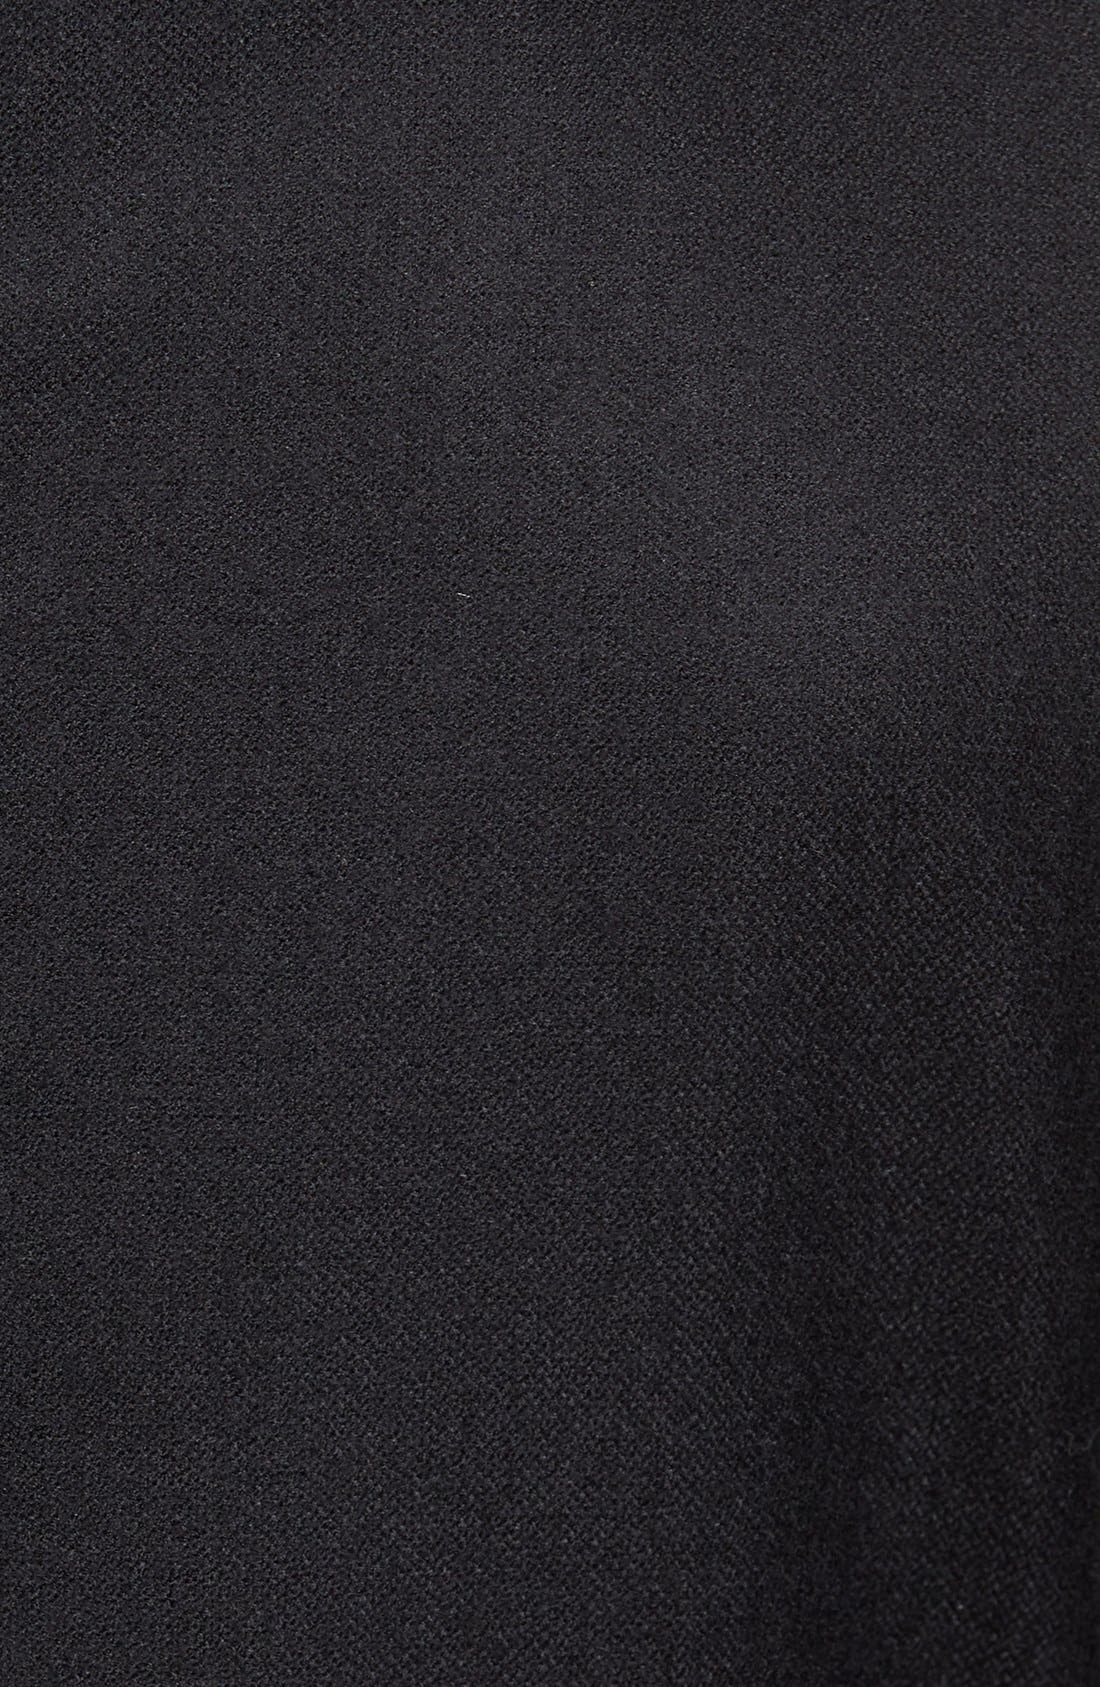 Classic Fit Wool & Cashmere Blazer,                             Alternate thumbnail 5, color,                             001